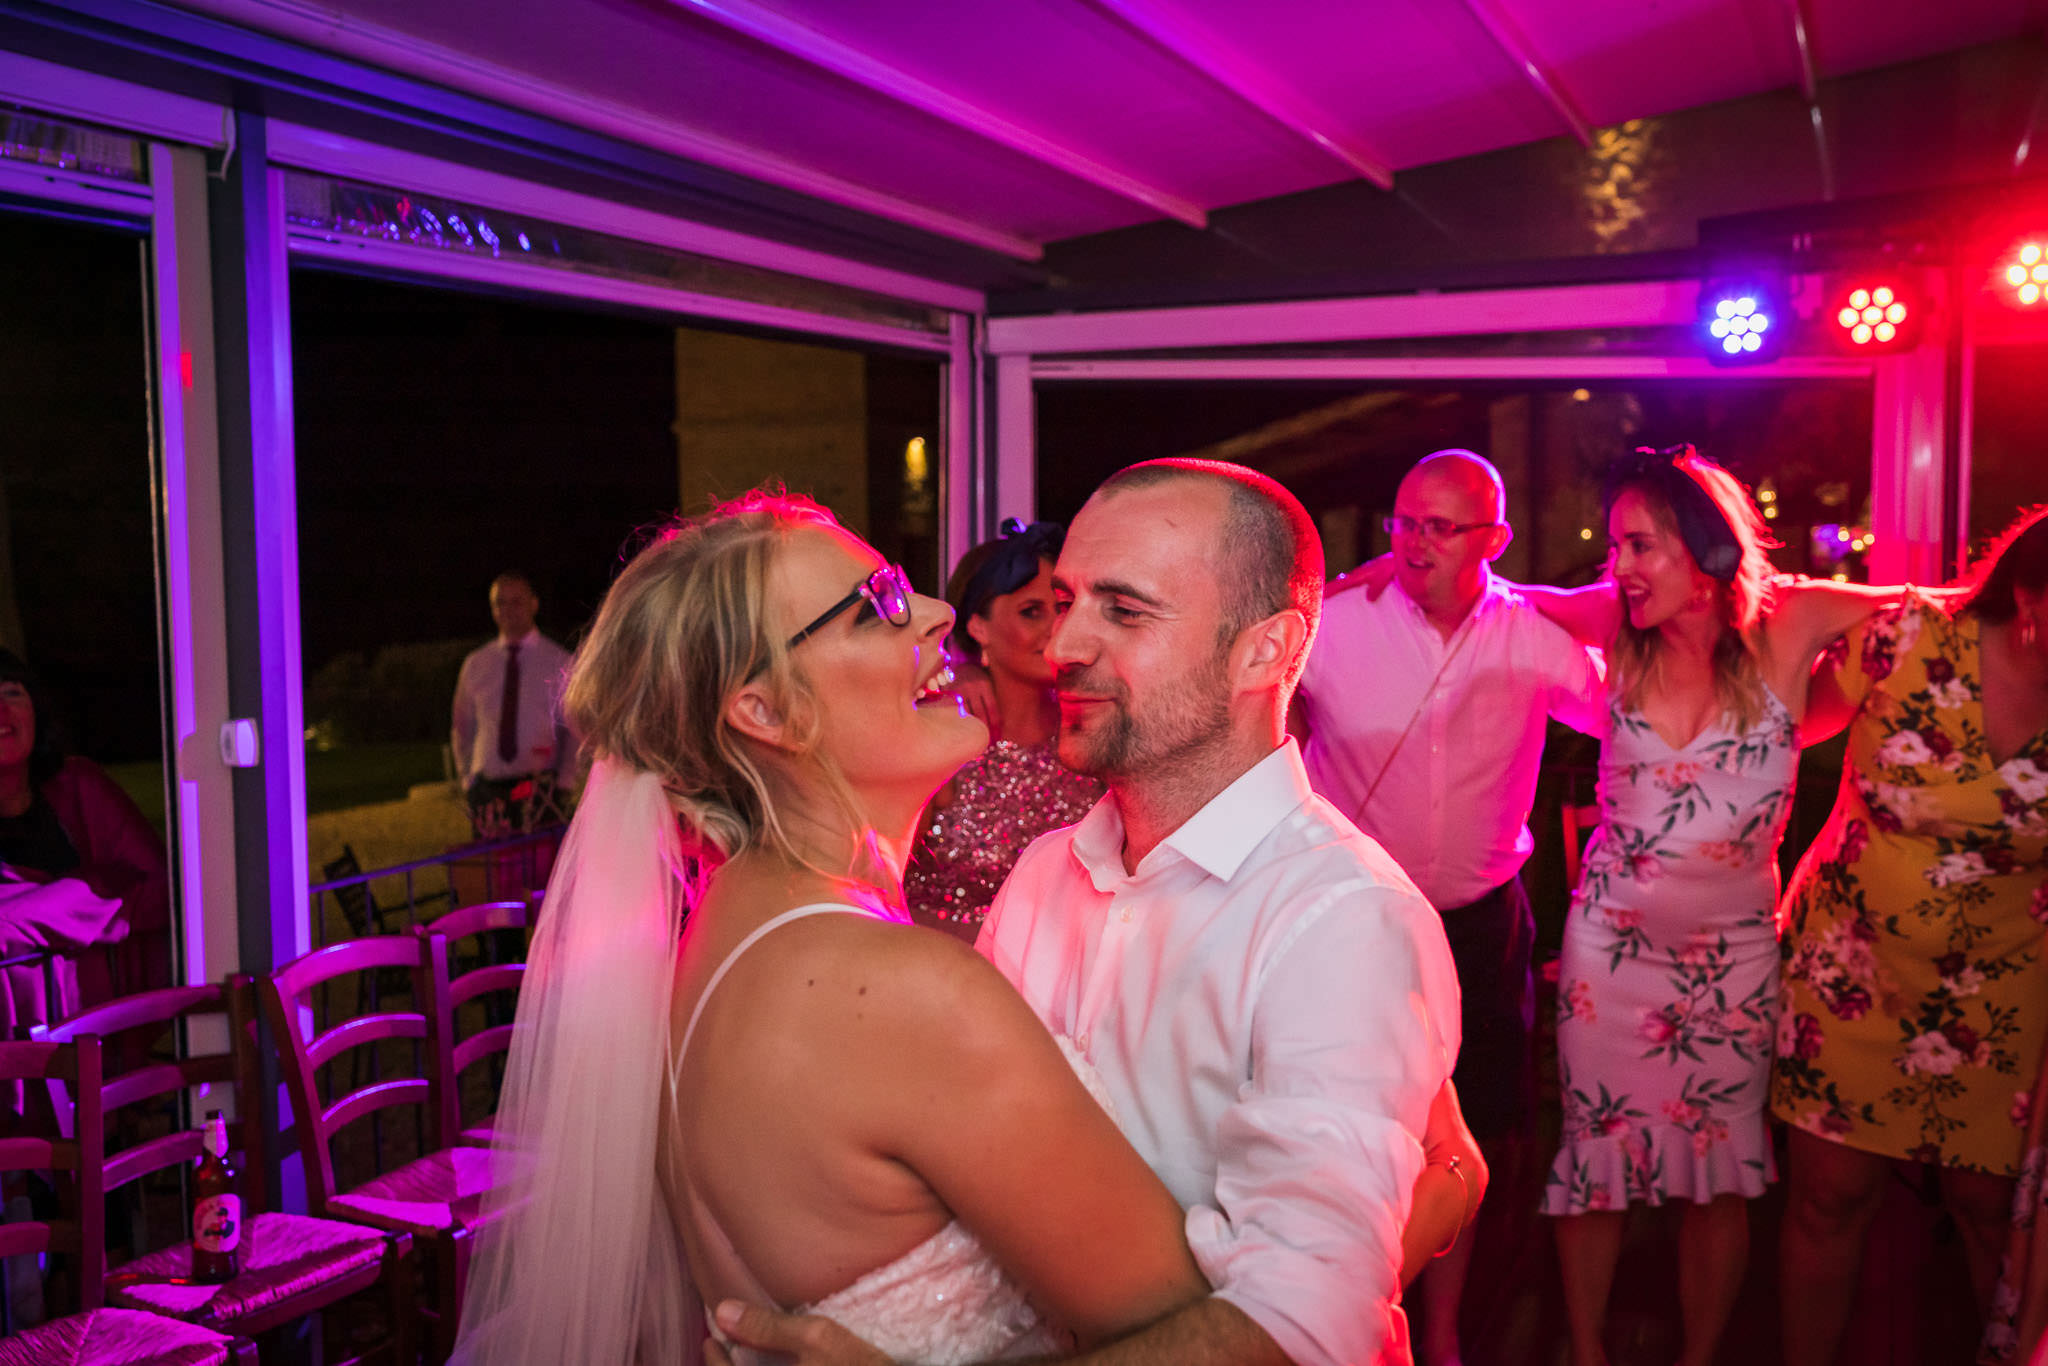 NC-2018-09-07_gemma-and-steve-wedding-0560.jpg